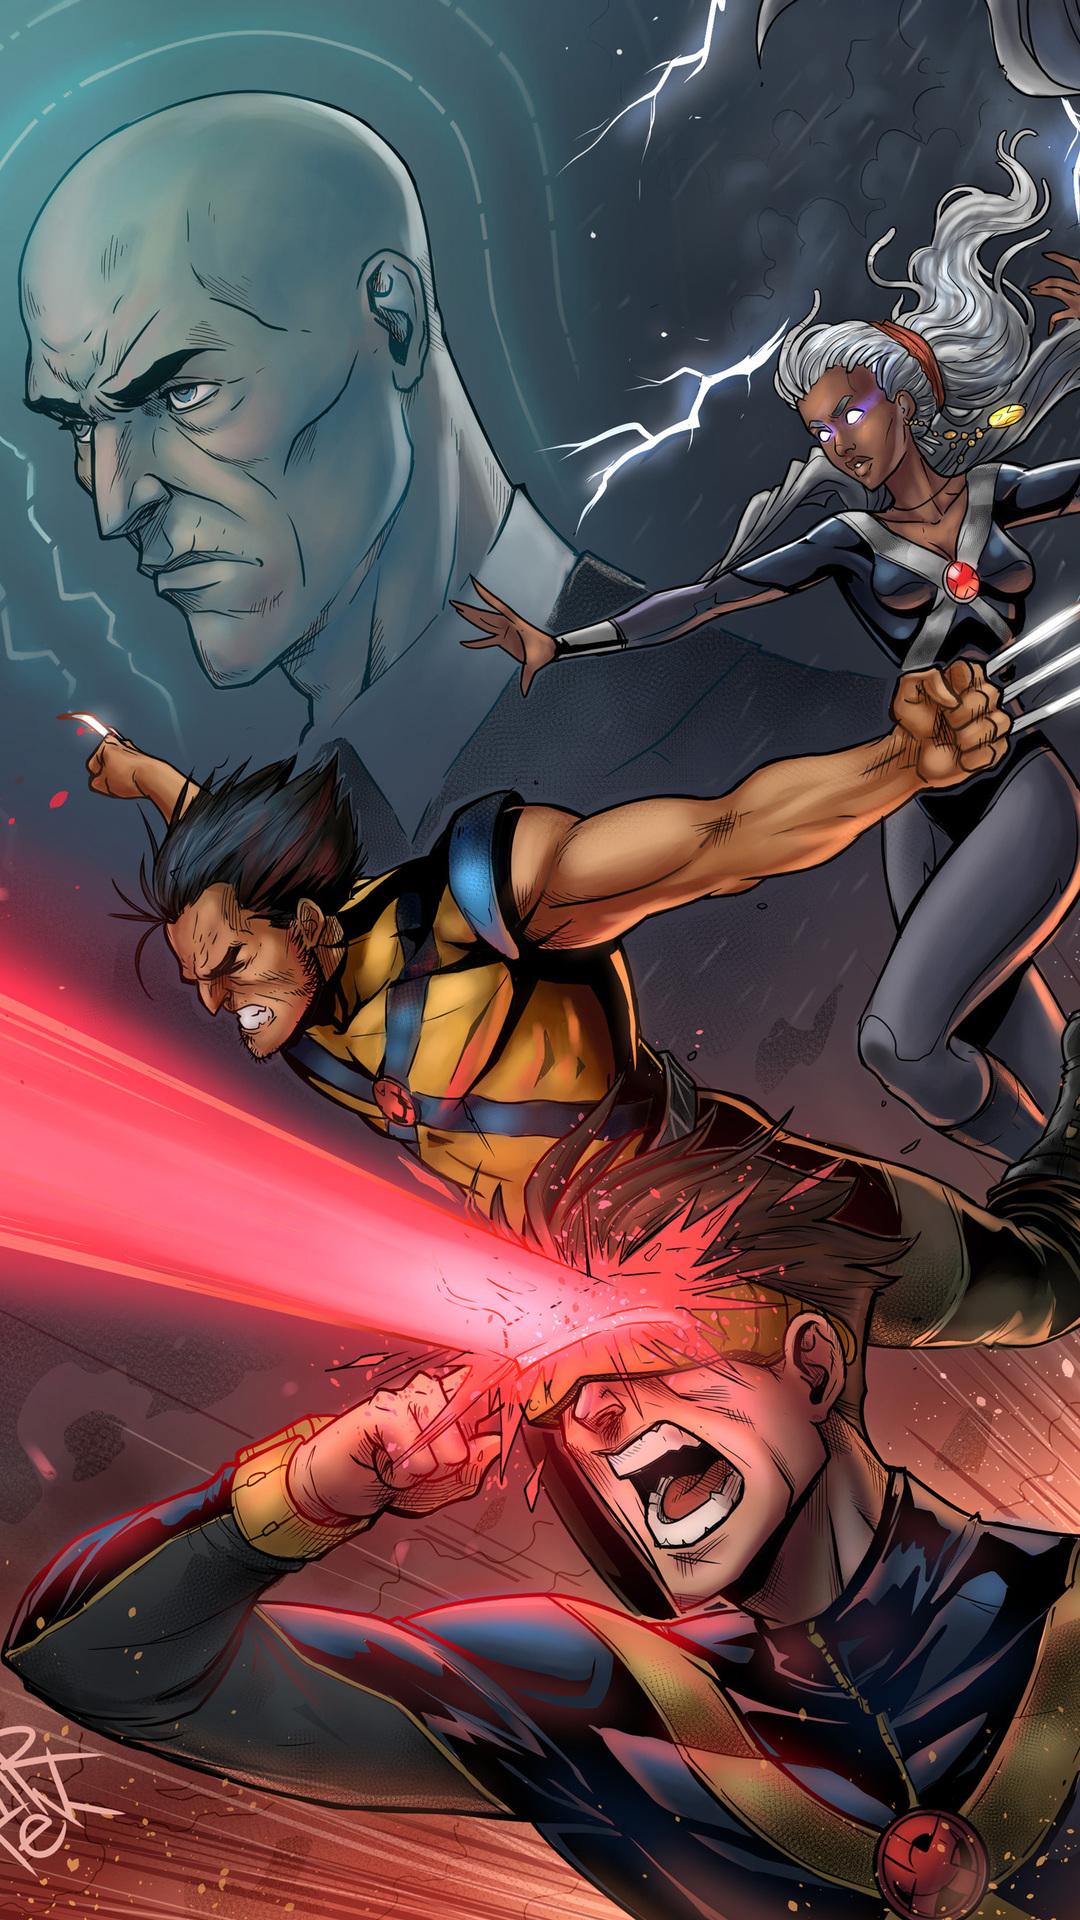 x-men-cyclops-wolverine-comic-artwork-sv.jpg